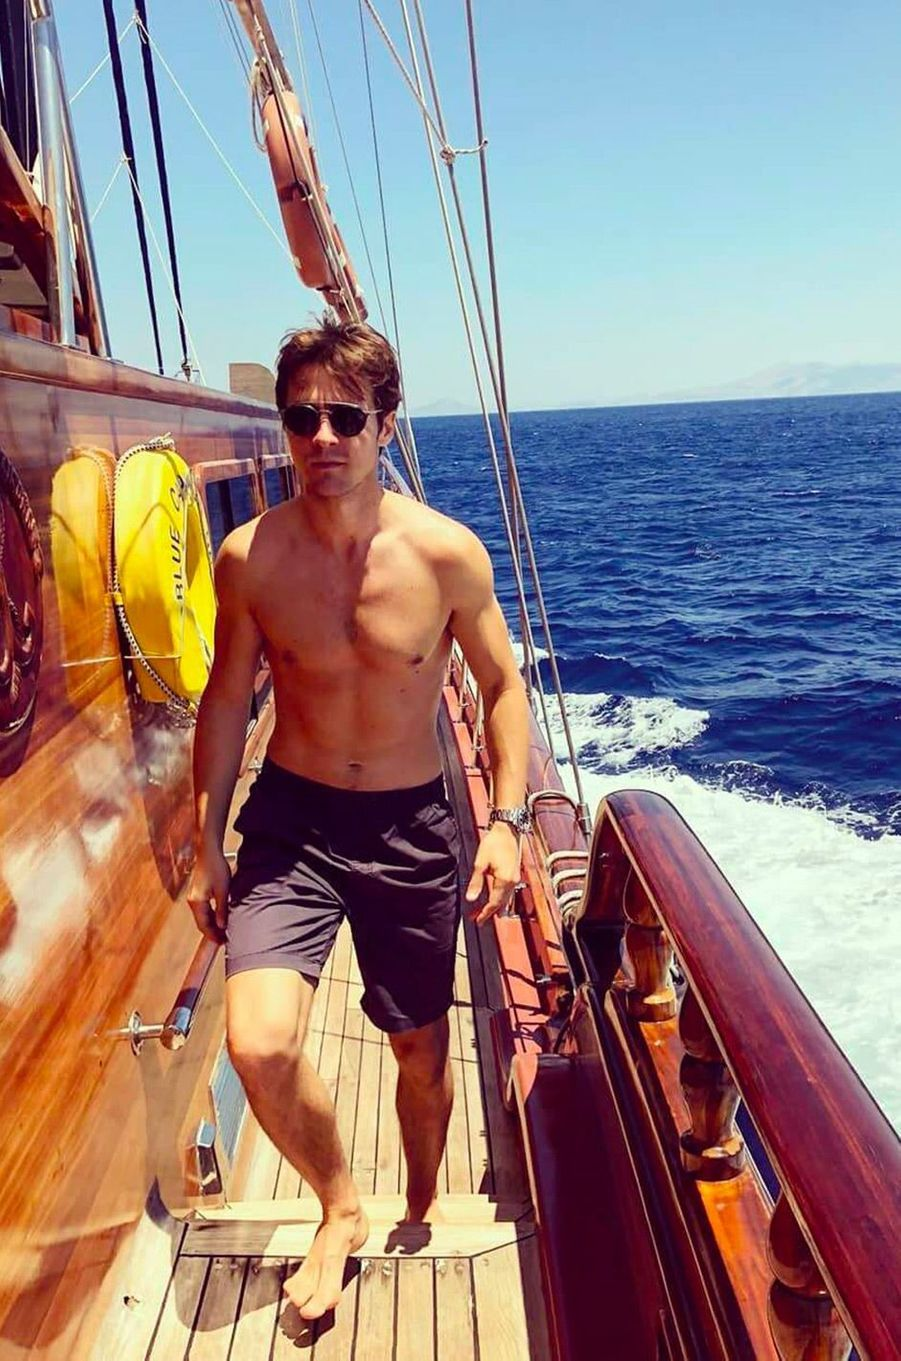 Julien Dereims en vacances avec Anouchka Delon